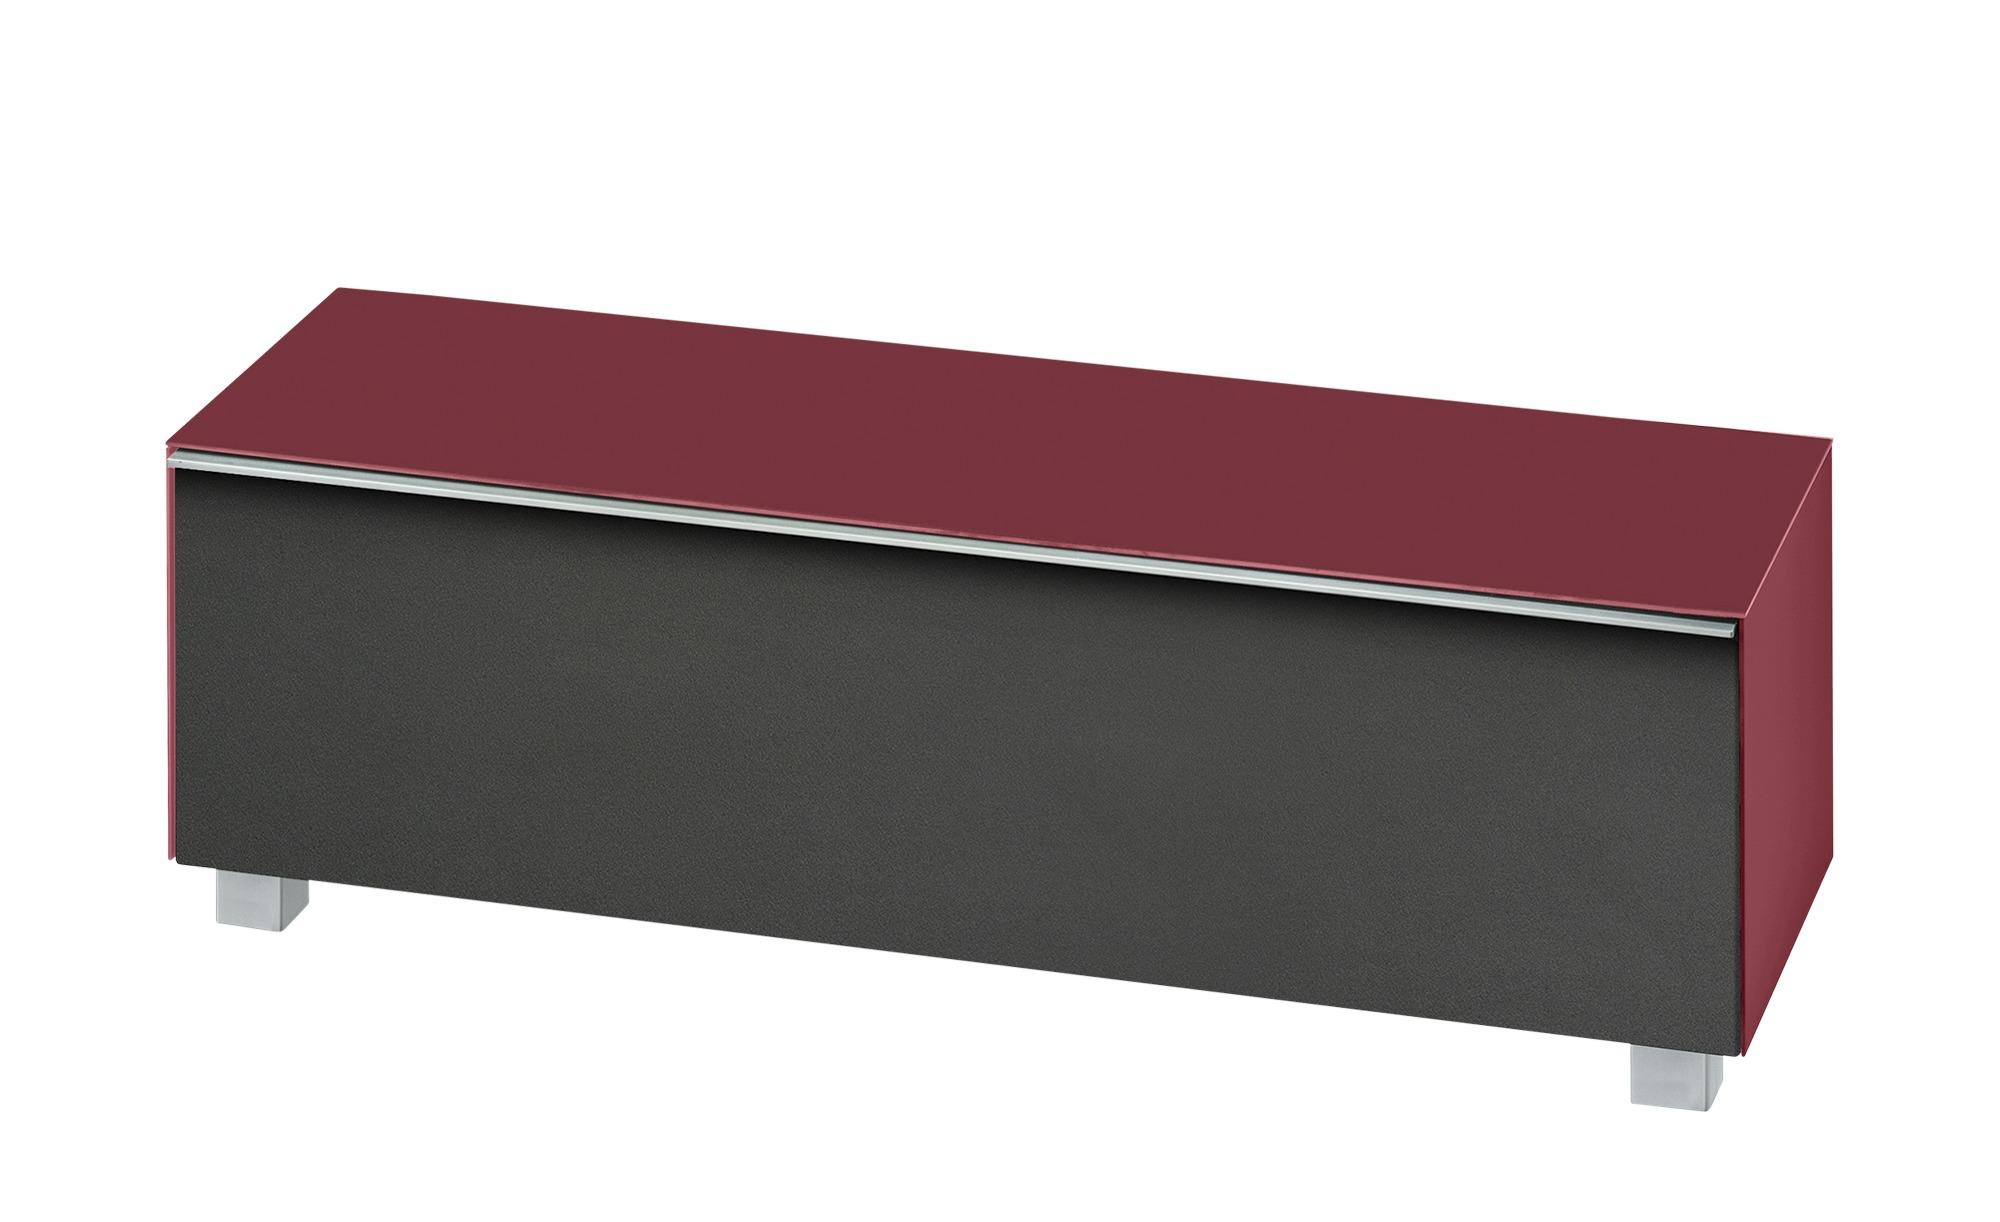 lowboard soundbase s breite 140 cm h he 43 cm rot online kaufen bei woonio. Black Bedroom Furniture Sets. Home Design Ideas